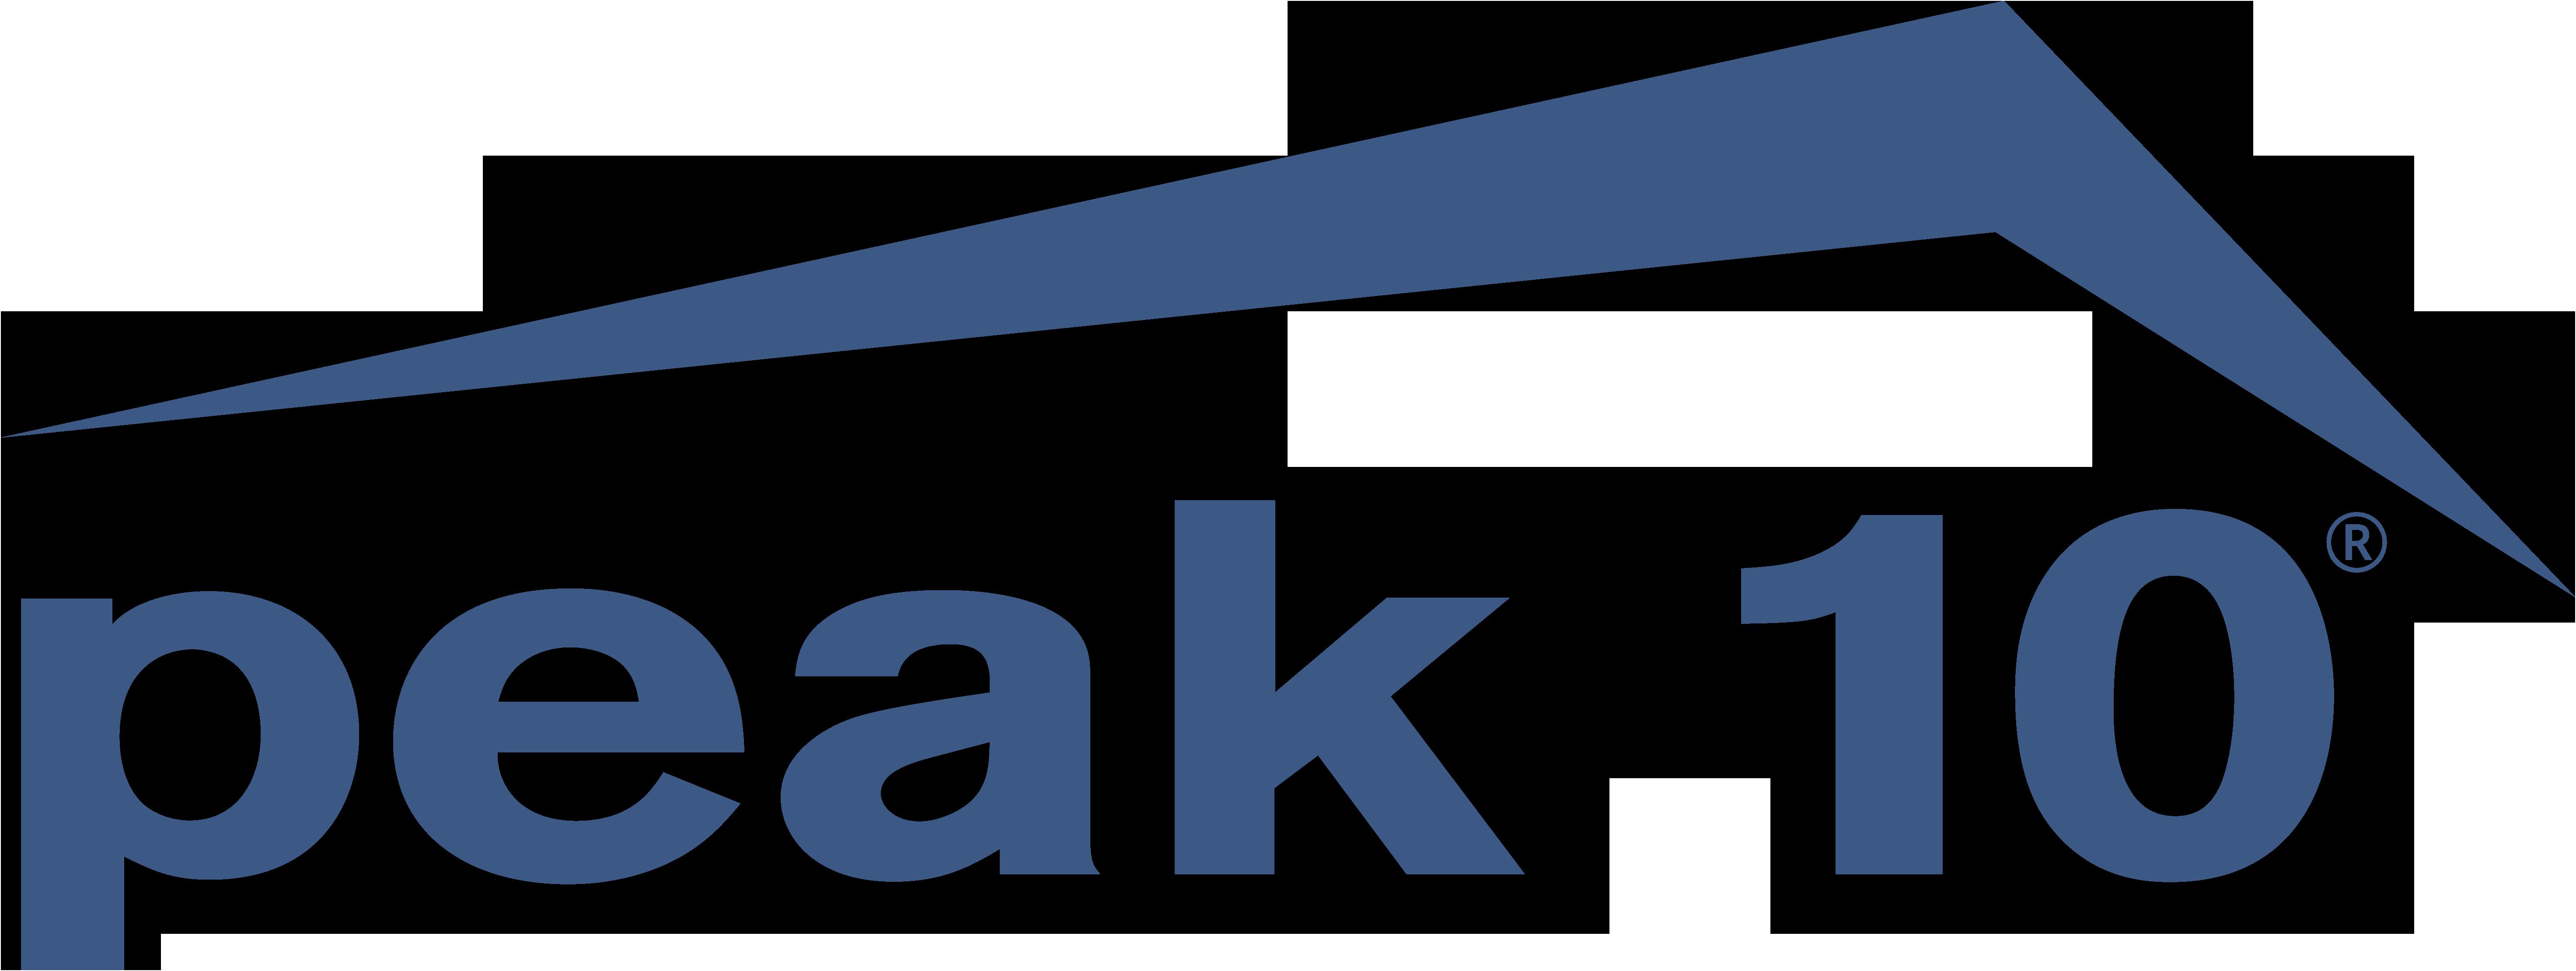 peak10-logo.png